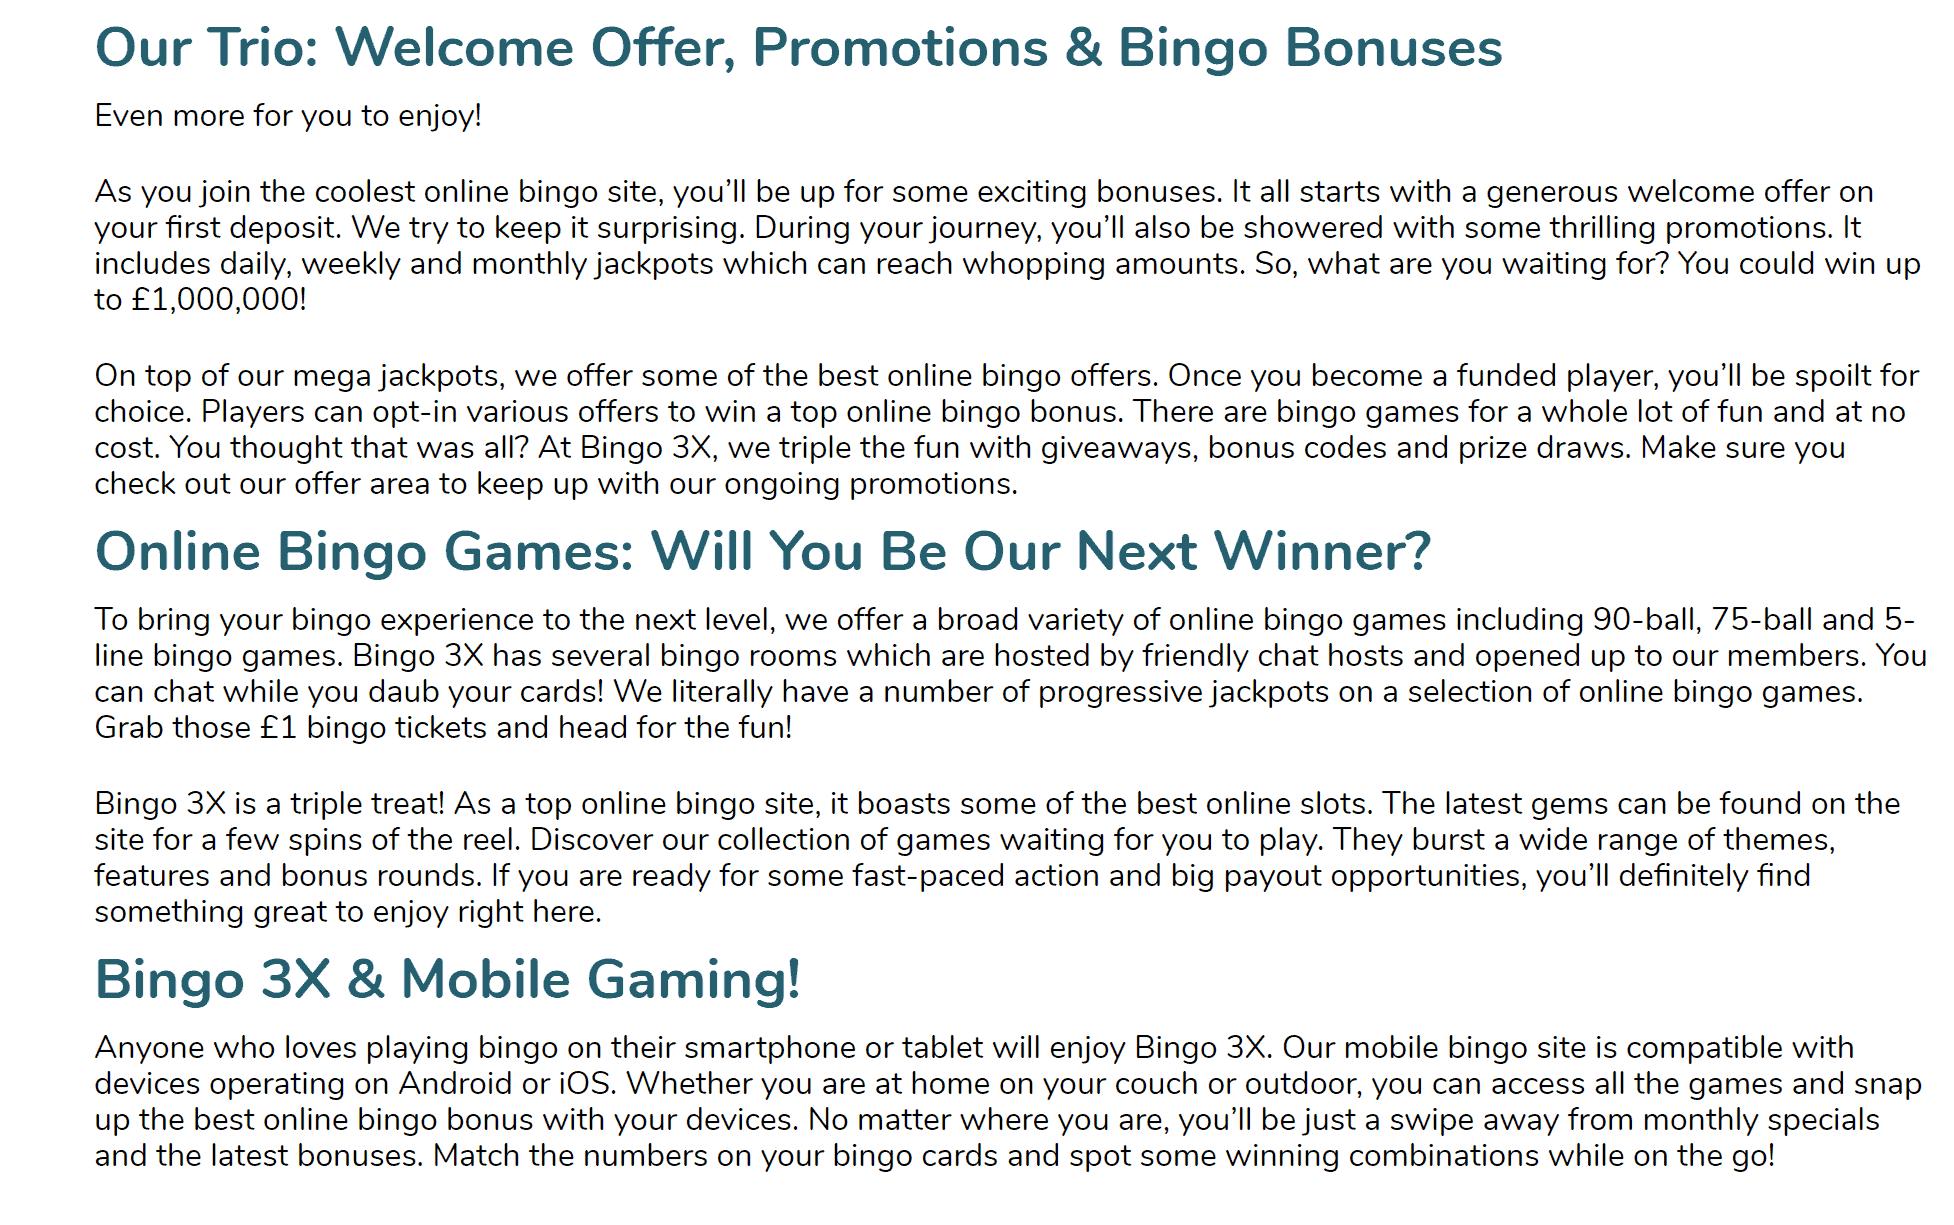 bingo 3x promo